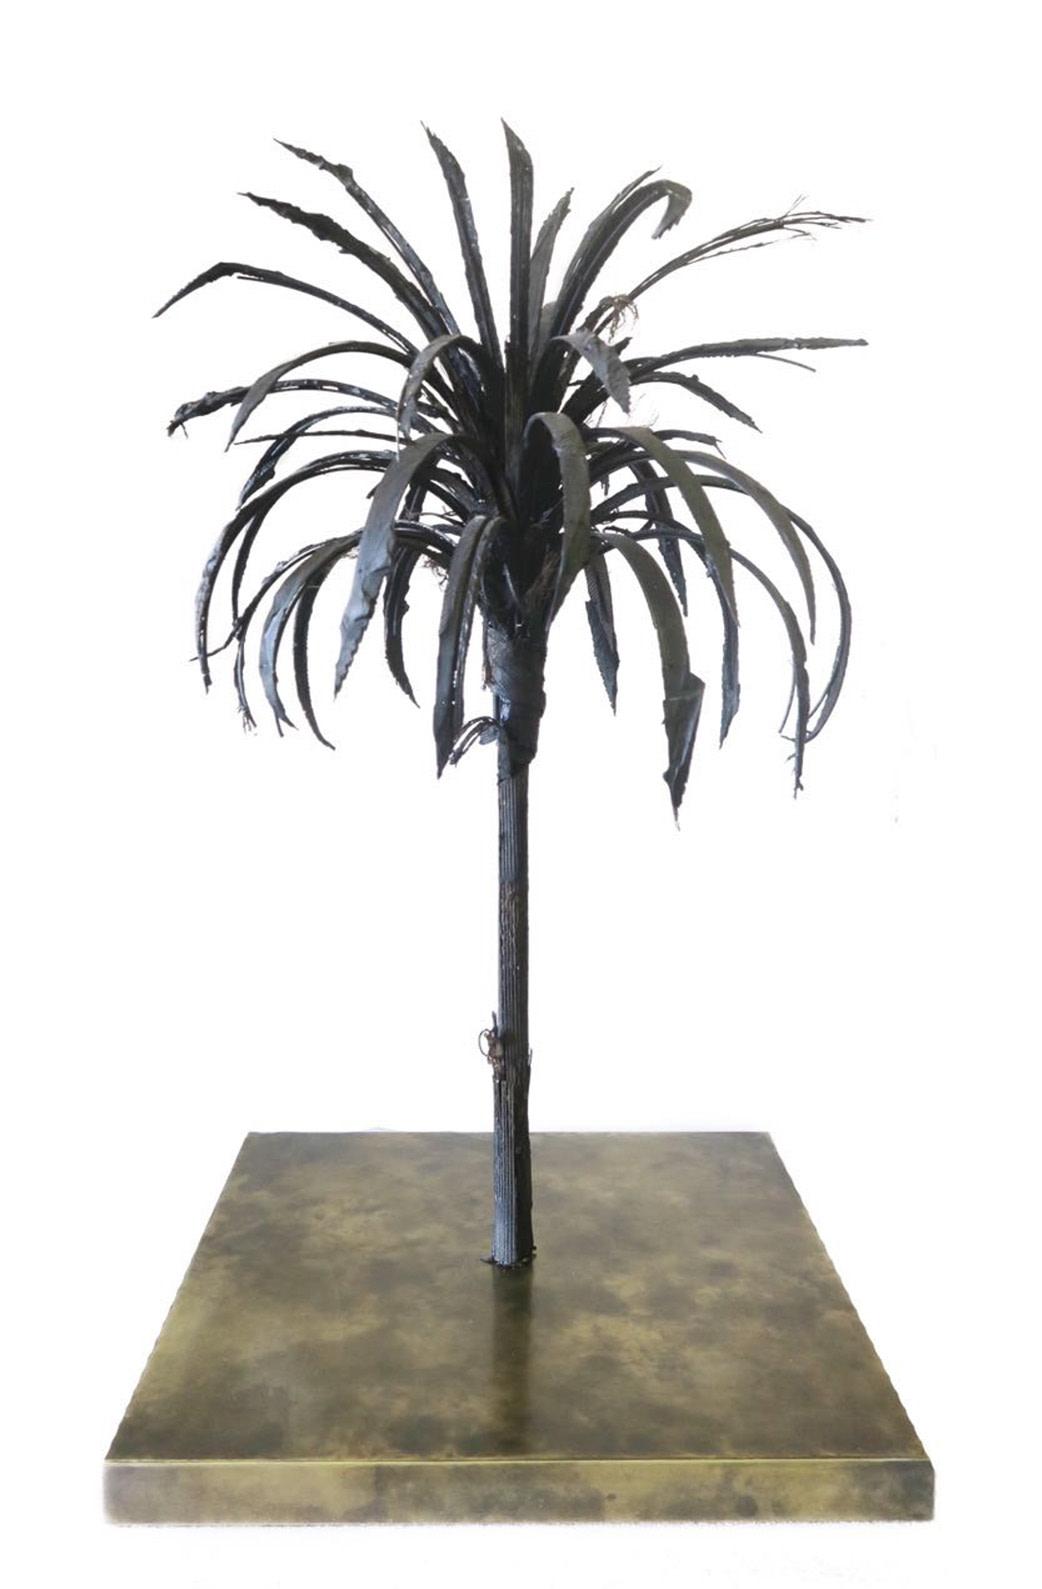 <span class=&#34;link fancybox-details-link&#34;><a href=&#34;/exhibitions/13/works/artworks502/&#34;>View Detail Page</a></span><div class=&#34;artist&#34;><strong>Douglas White</strong></div><div class=&#34;title&#34;><em>Black Palm</em>, 2018</div><div class=&#34;medium&#34;>Tyre fragments, steel, brass base</div><div class=&#34;dimensions&#34;>75x40x40cm </div>